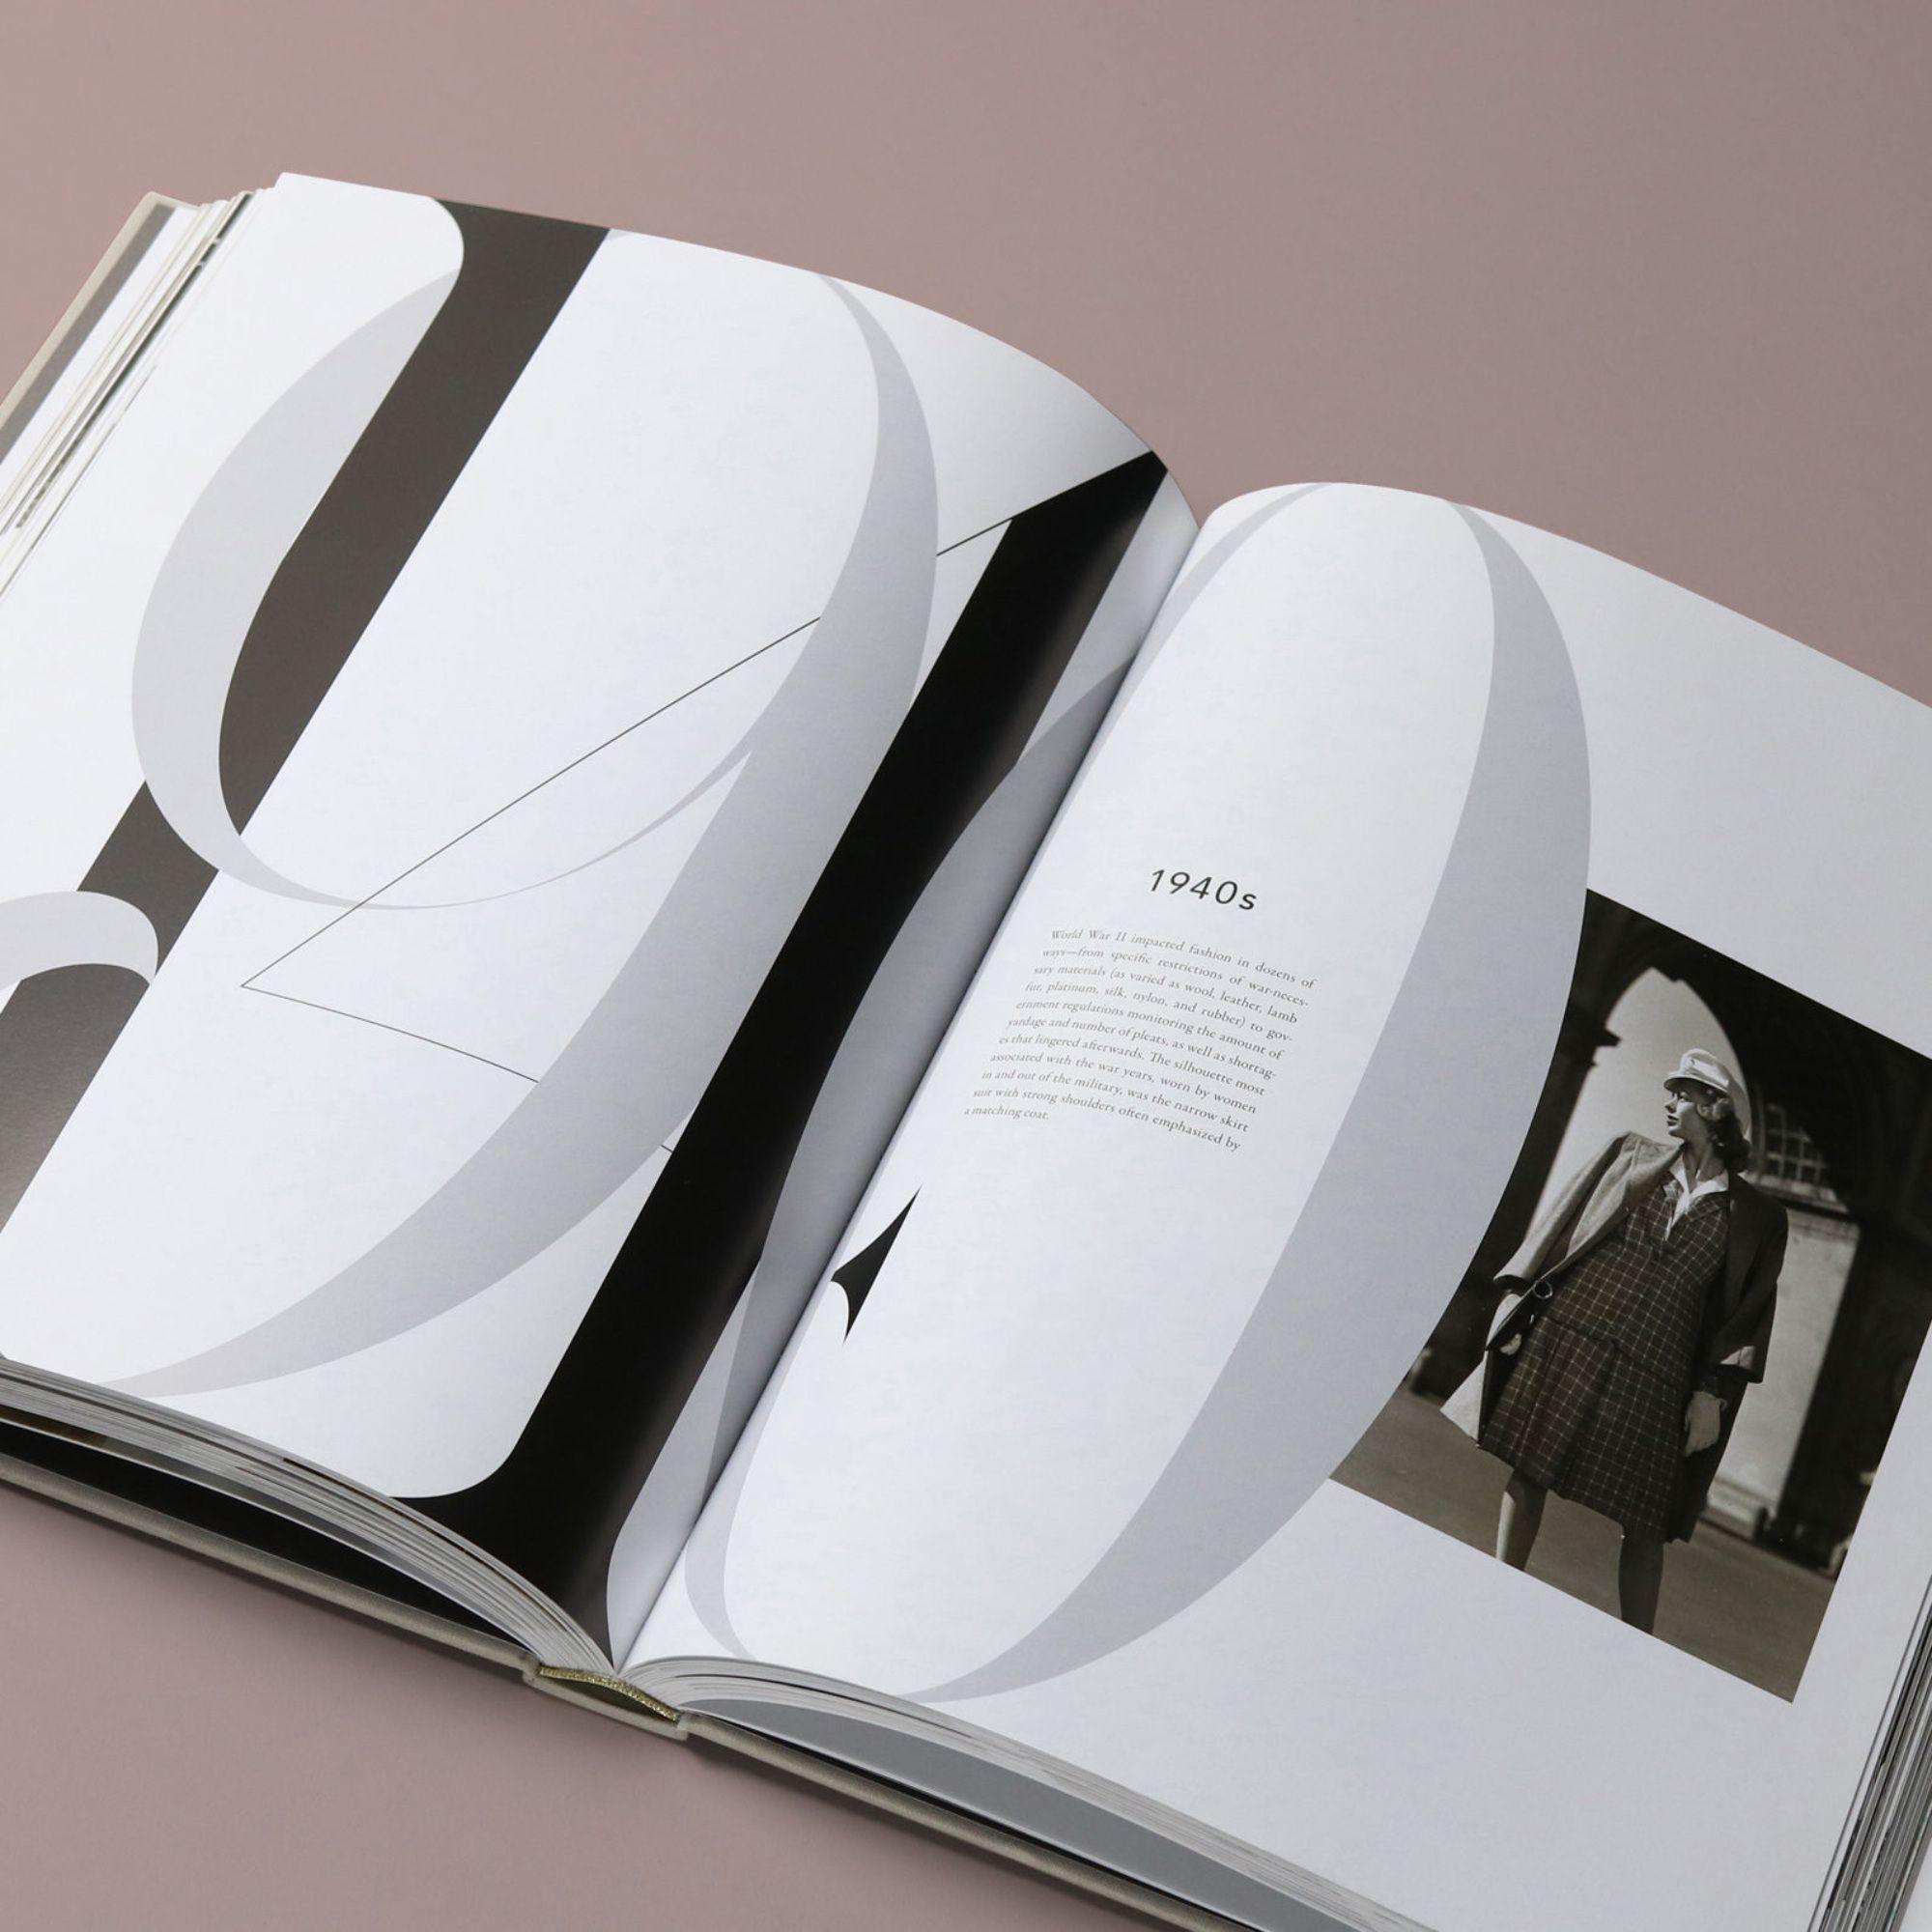 mendo-book-fashion-a-timeline-rizzoli-studio-03-e1488987067230-2000x2000-c-default.jpg (2000×2000)